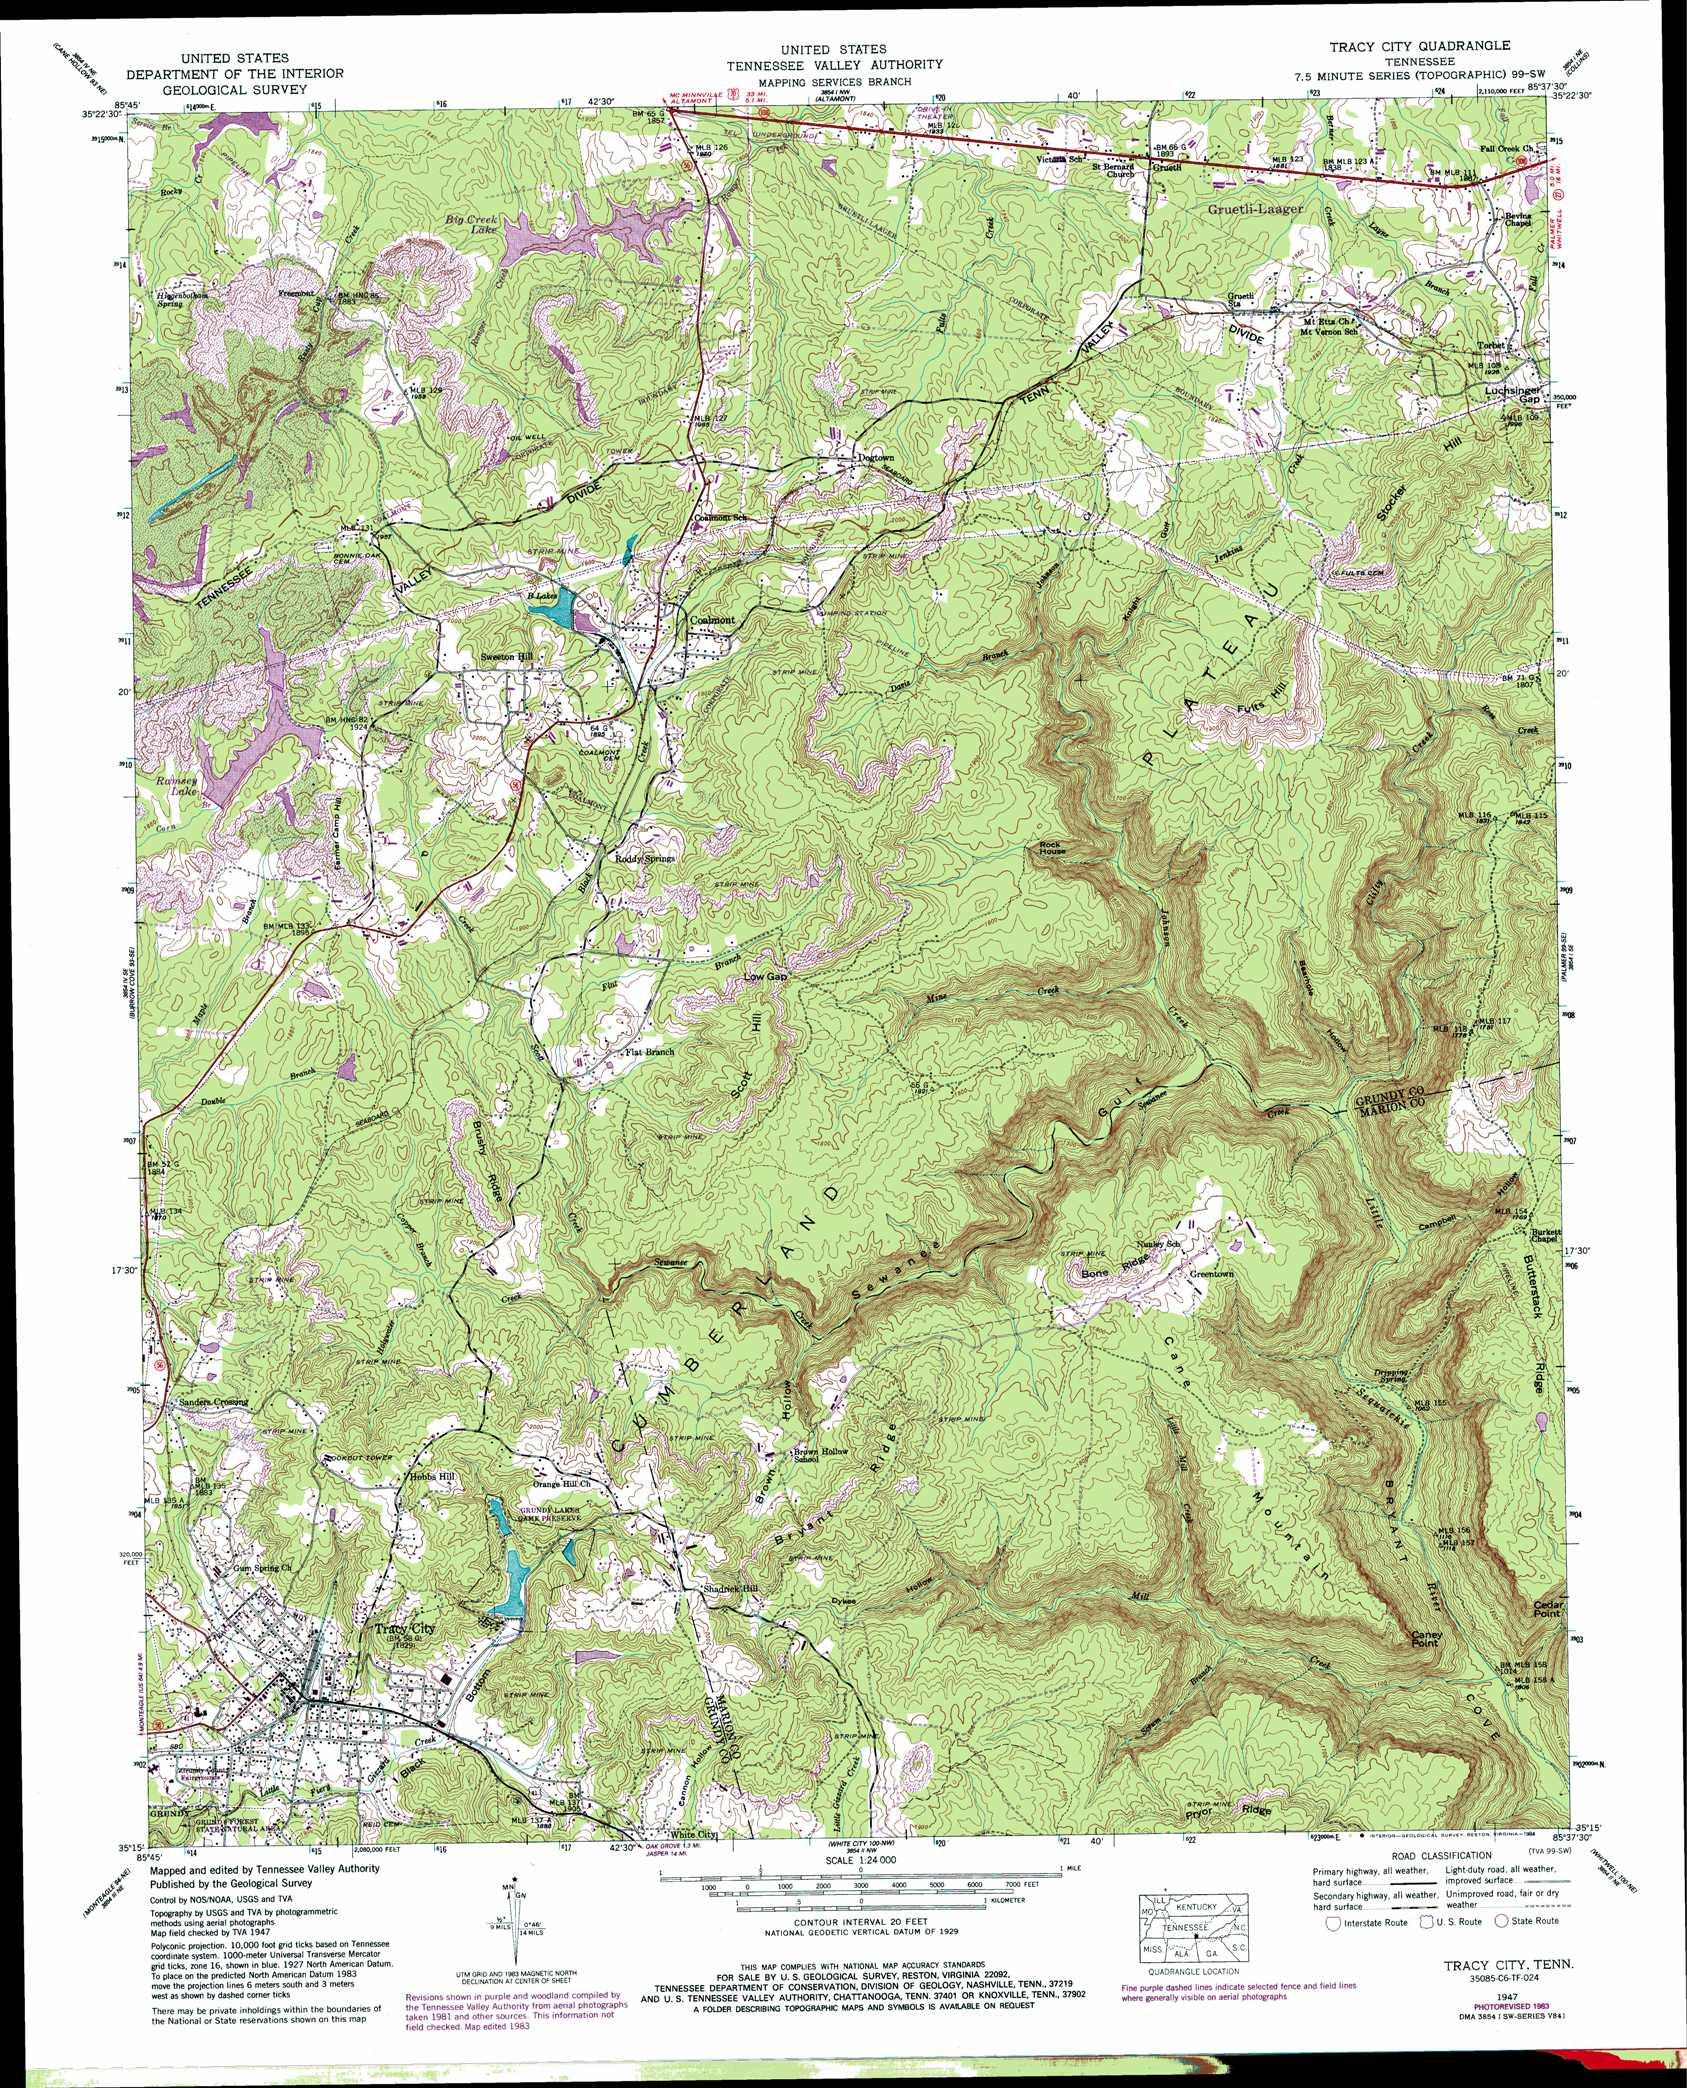 Tracy City topographic map TN USGS Topo Quad 35085c6